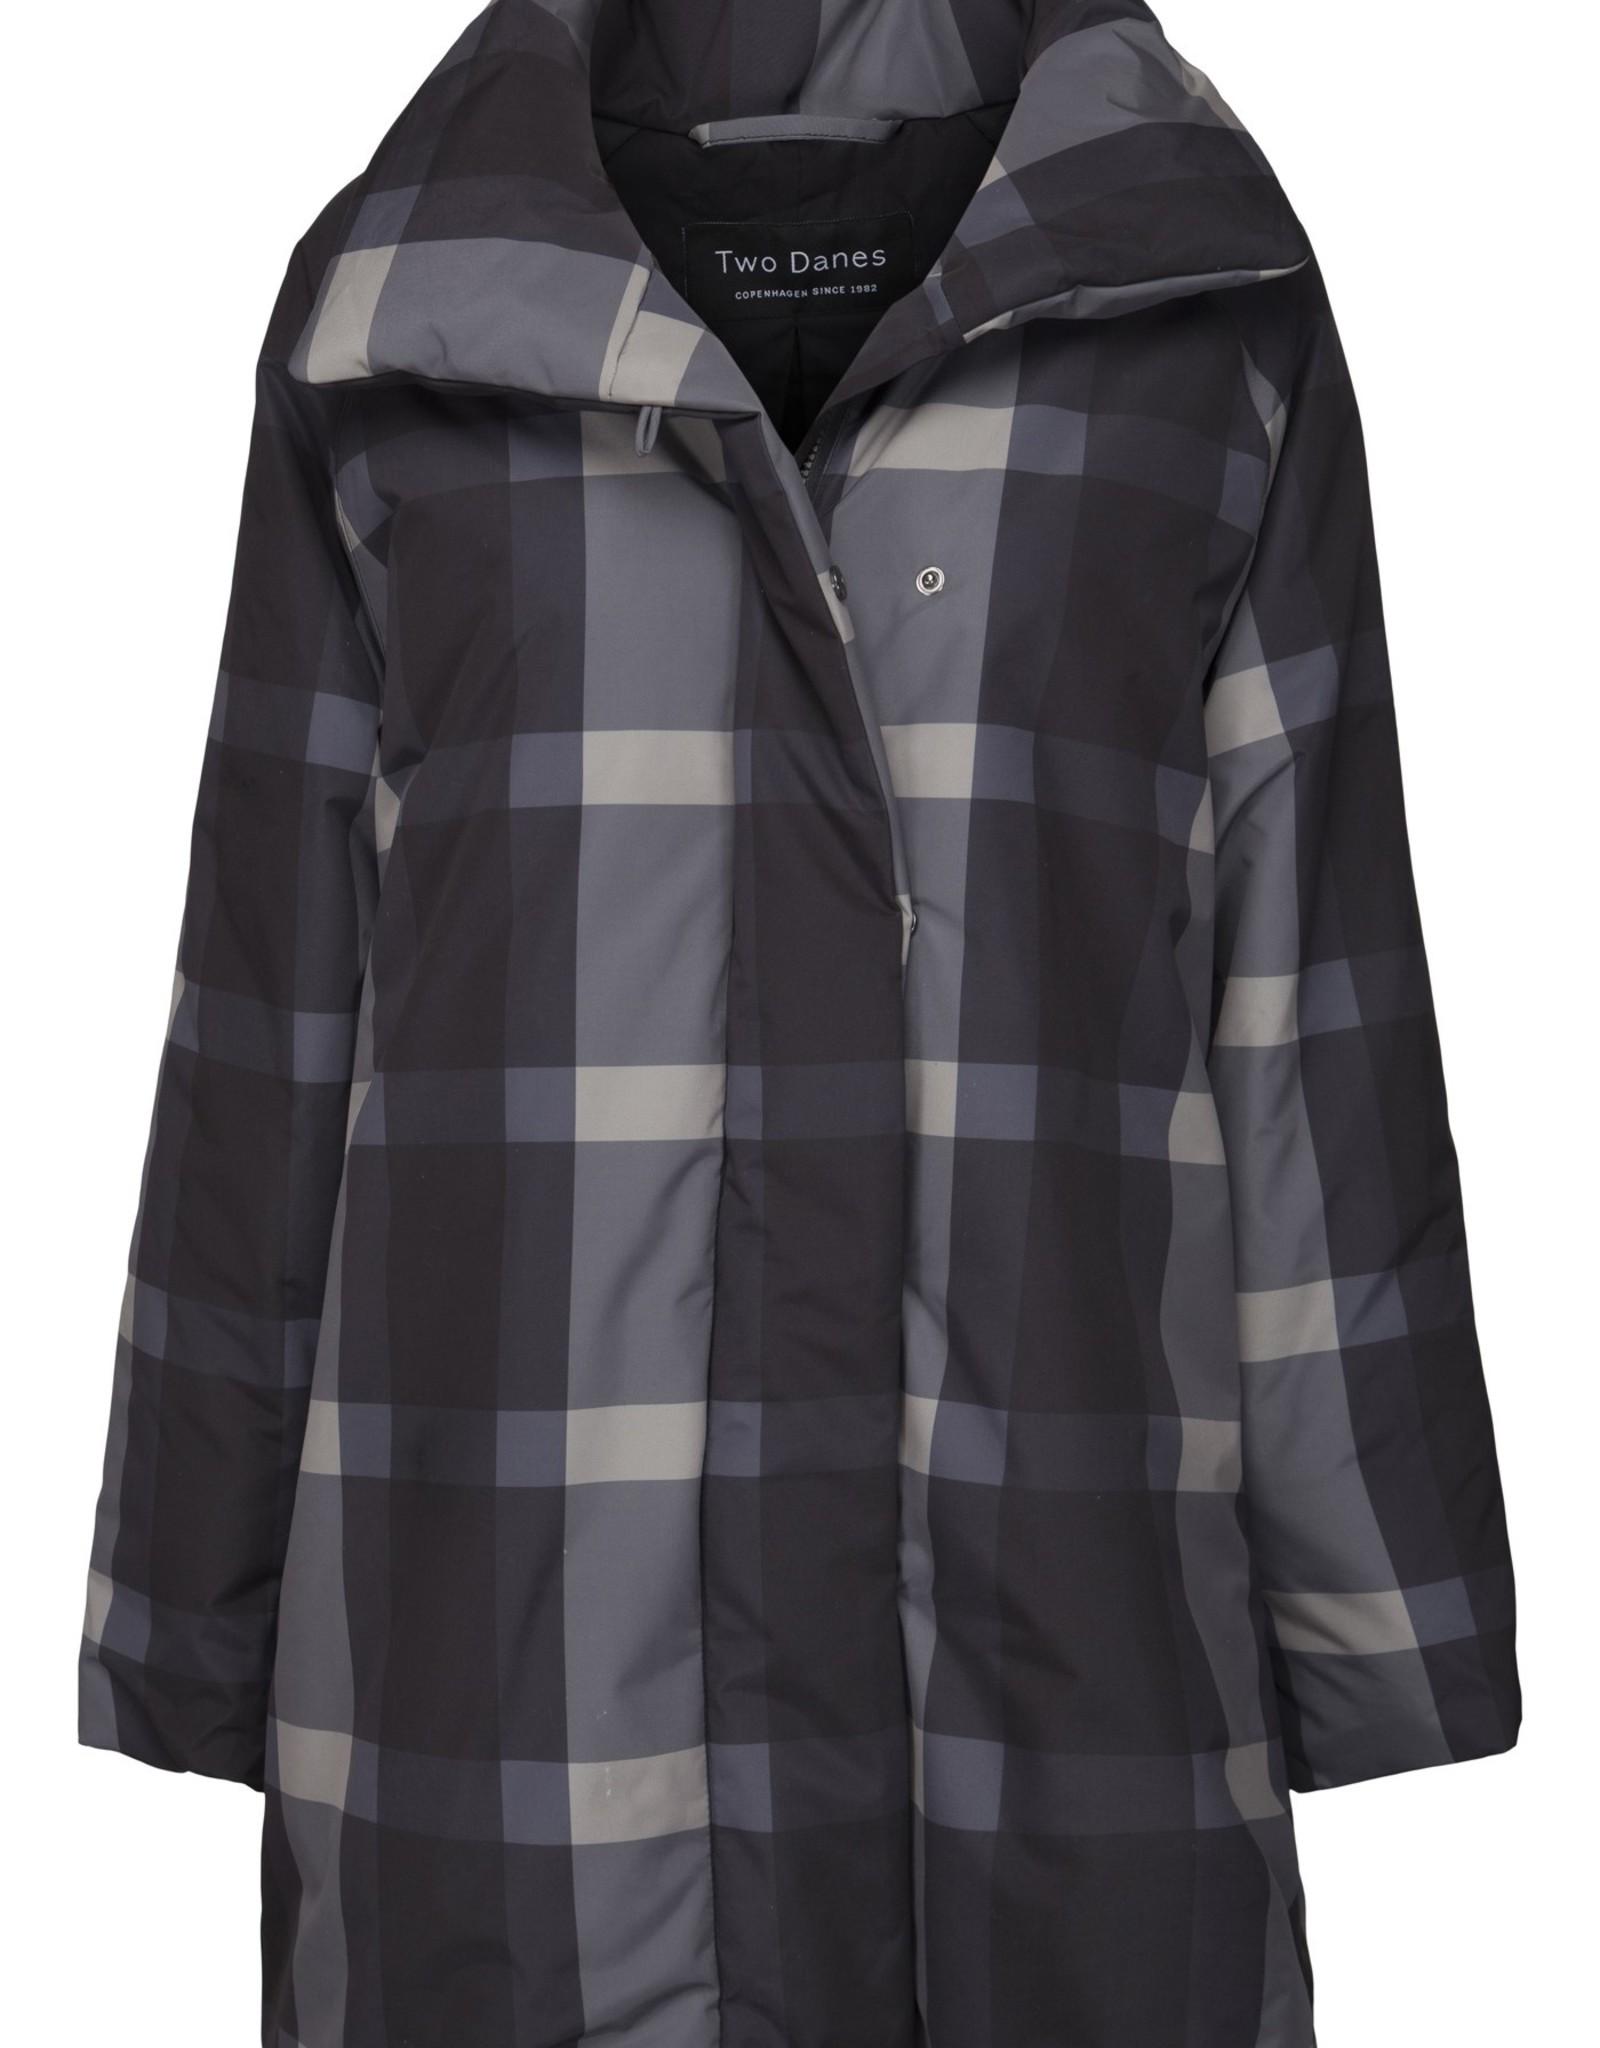 TWO DANES 41517 short olina coat